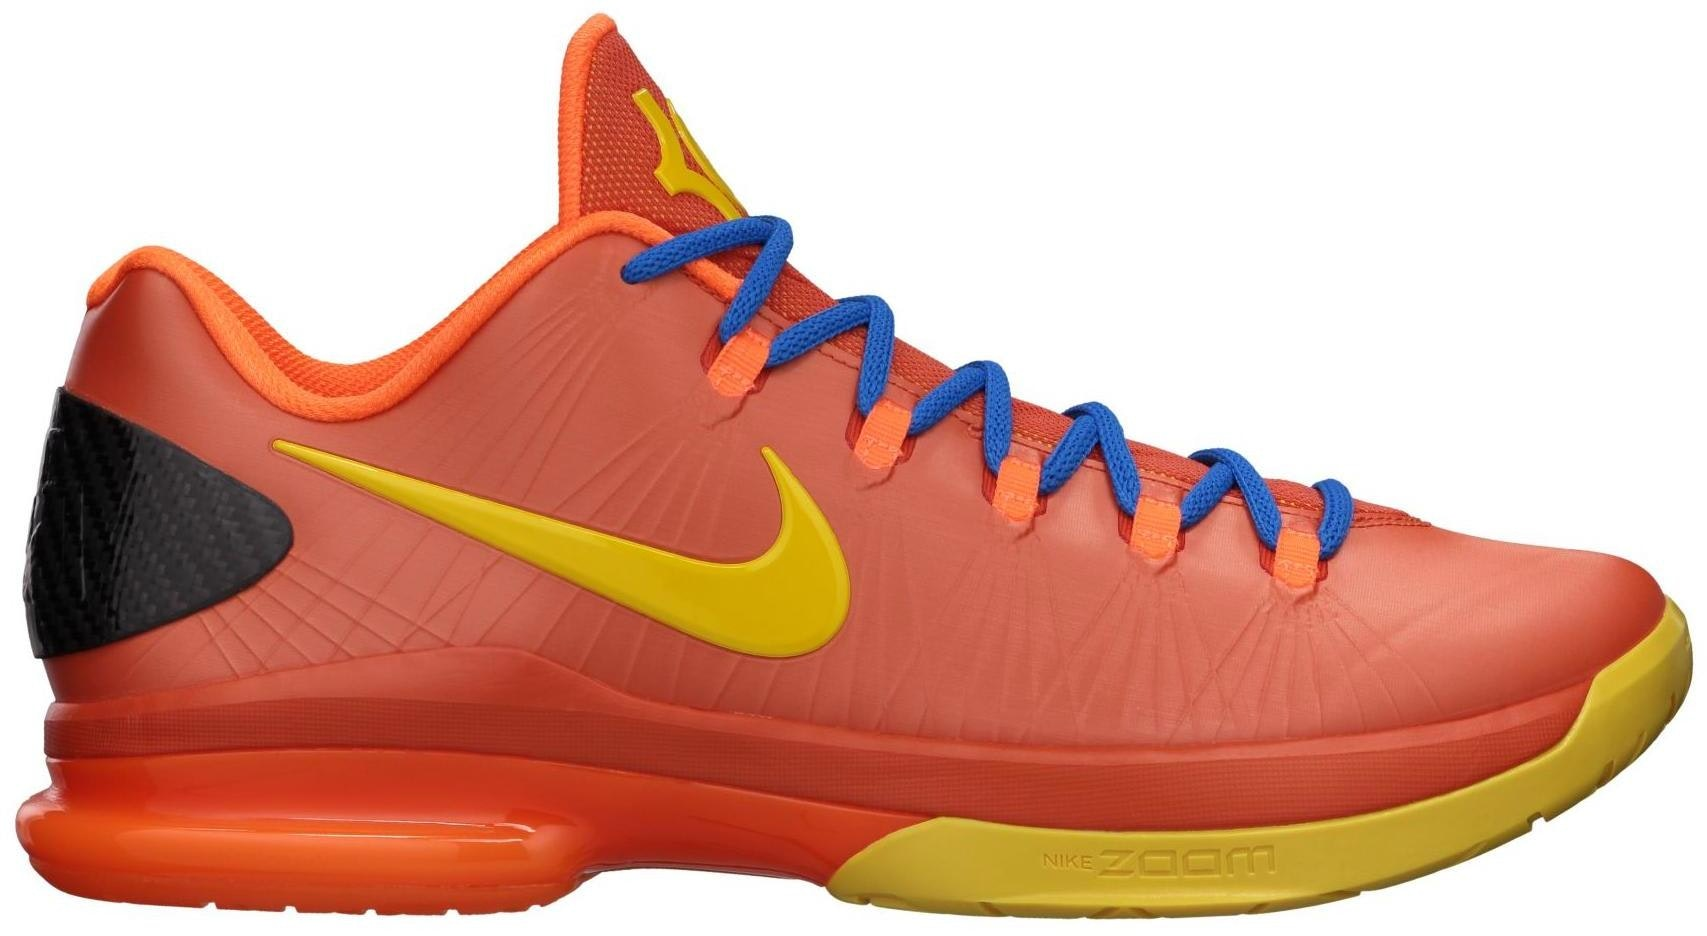 KD 5 Elite Team Orange